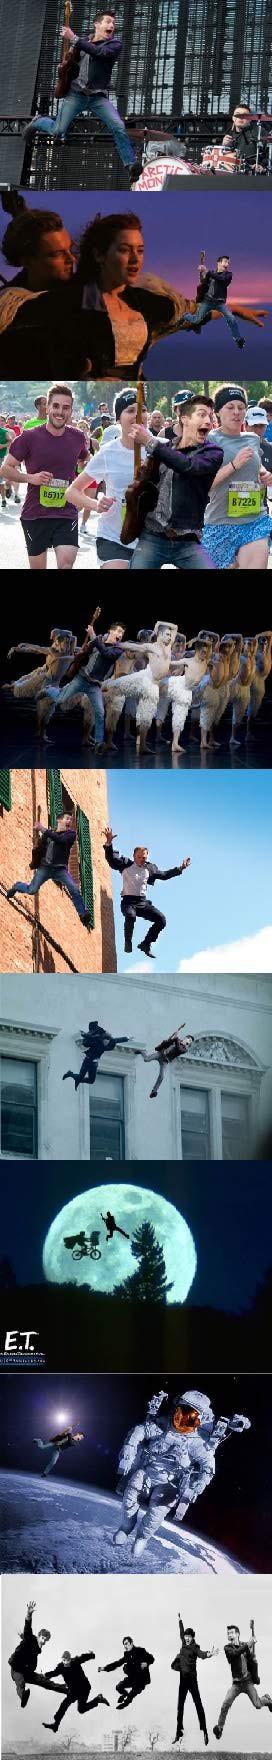 Alex Turner meme